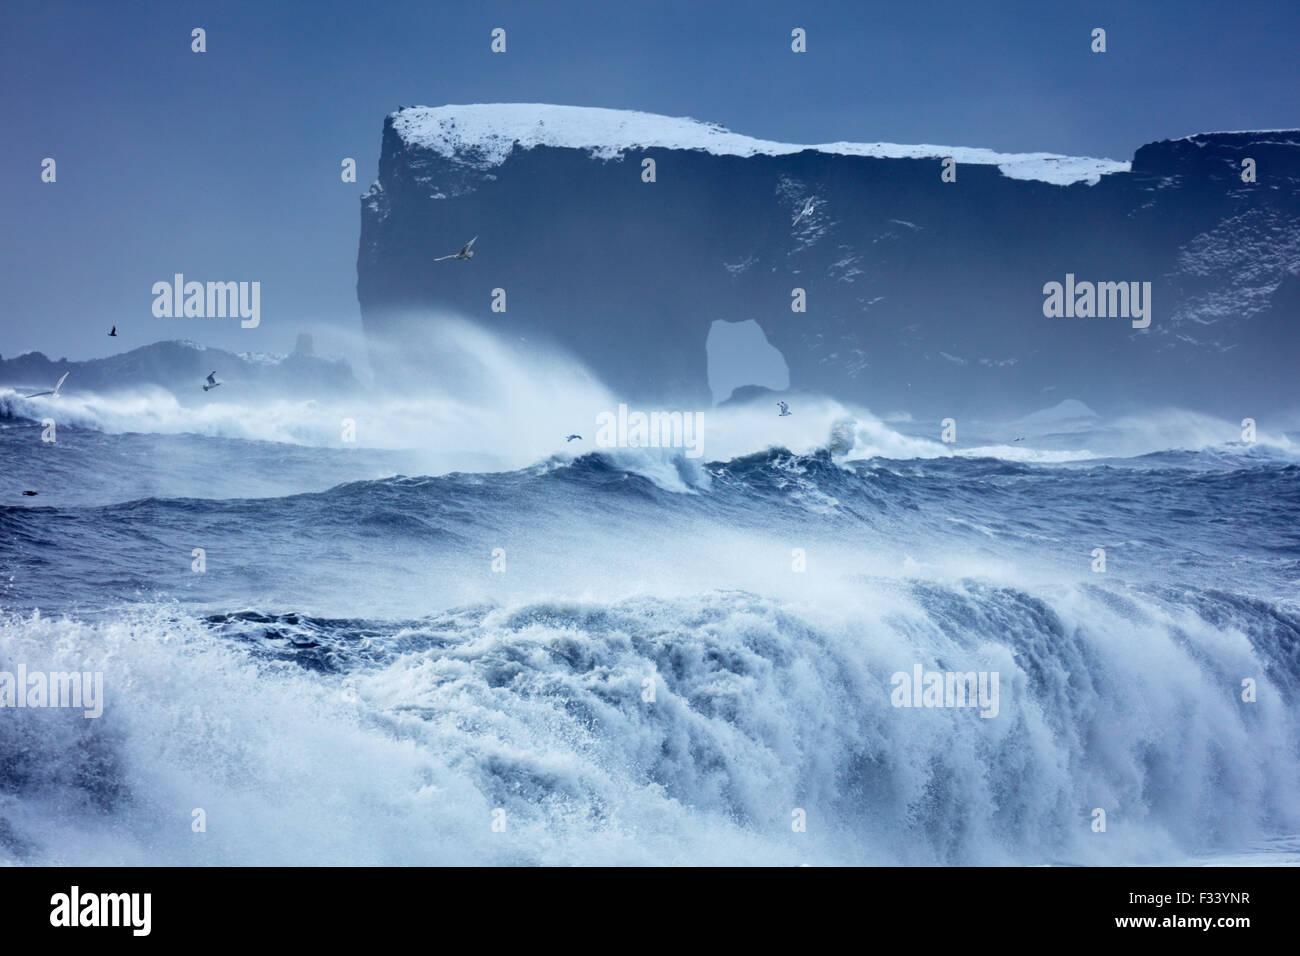 waves breaking on Reynisfjara with Dyrhólaey beyond, Iceland - Stock Image